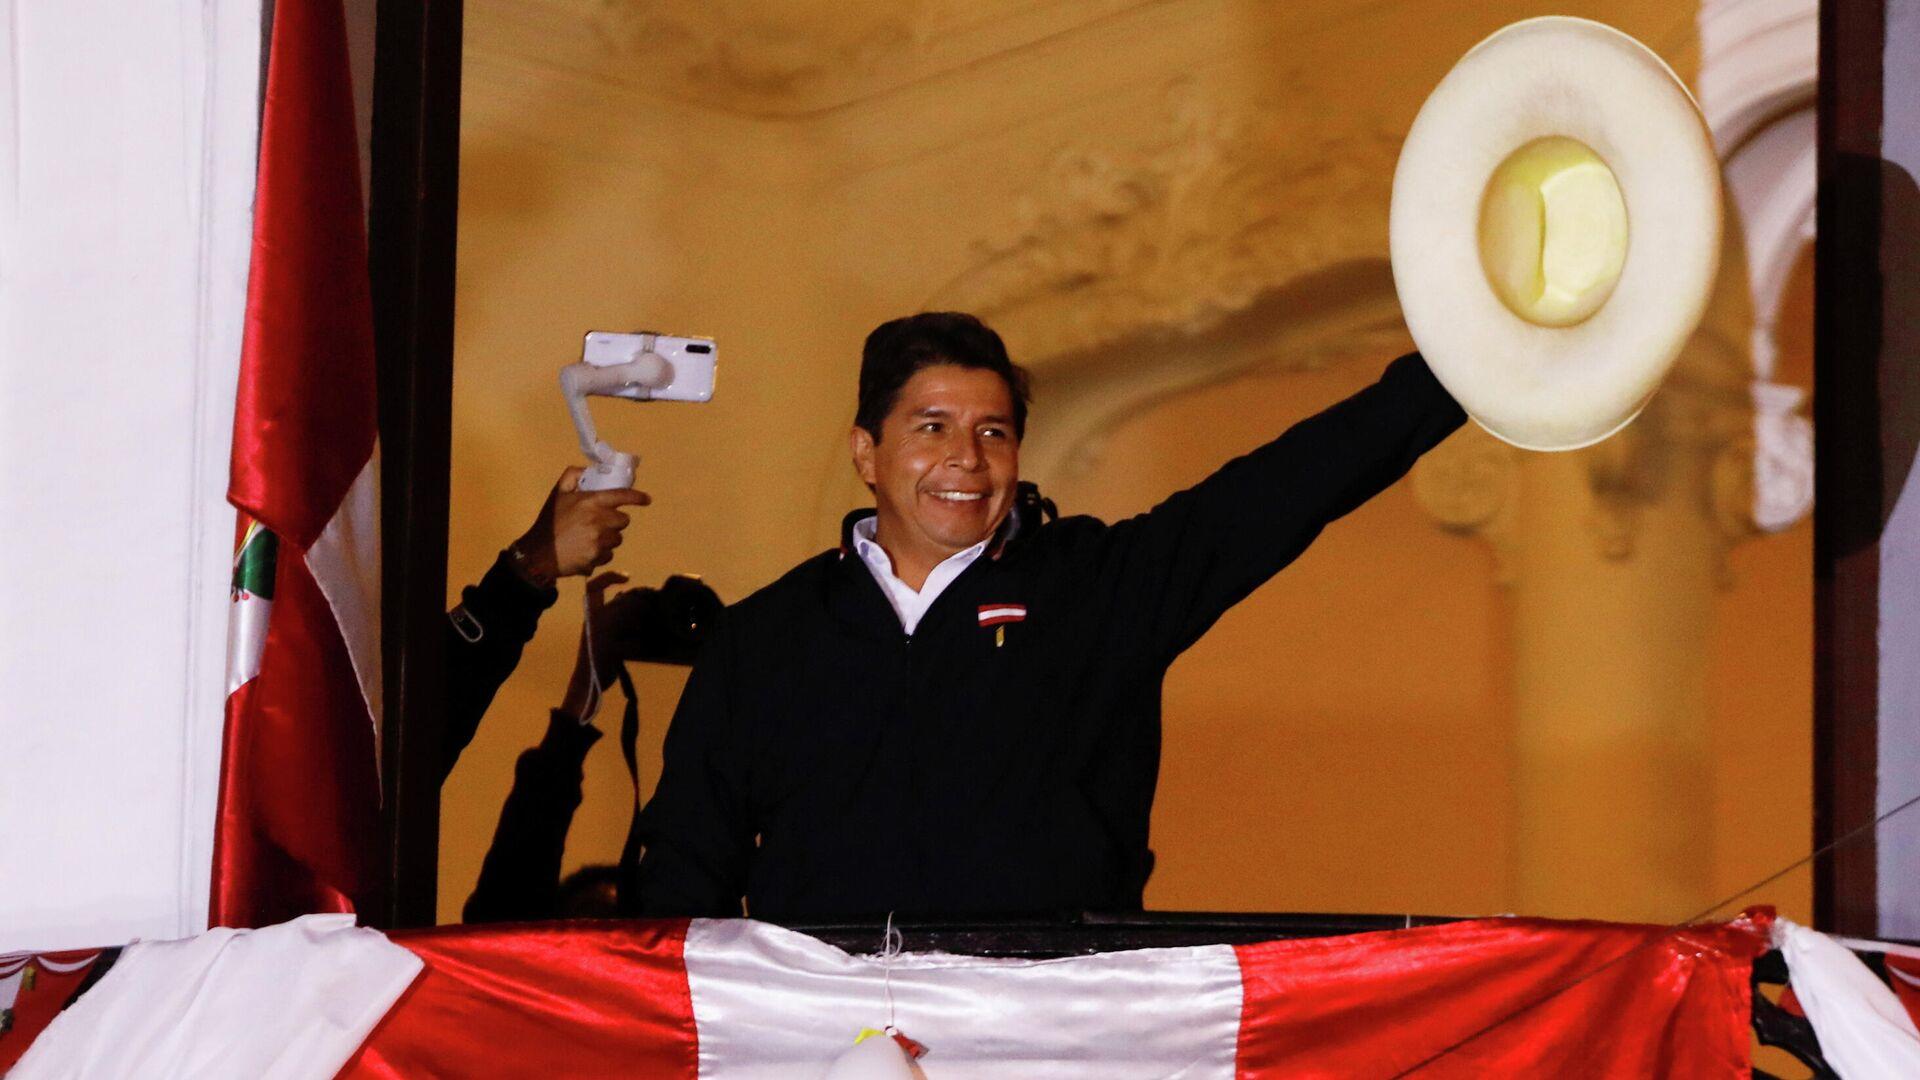 Pedro Castillo, candidato a la presidencia de Perú - Sputnik Mundo, 1920, 10.06.2021